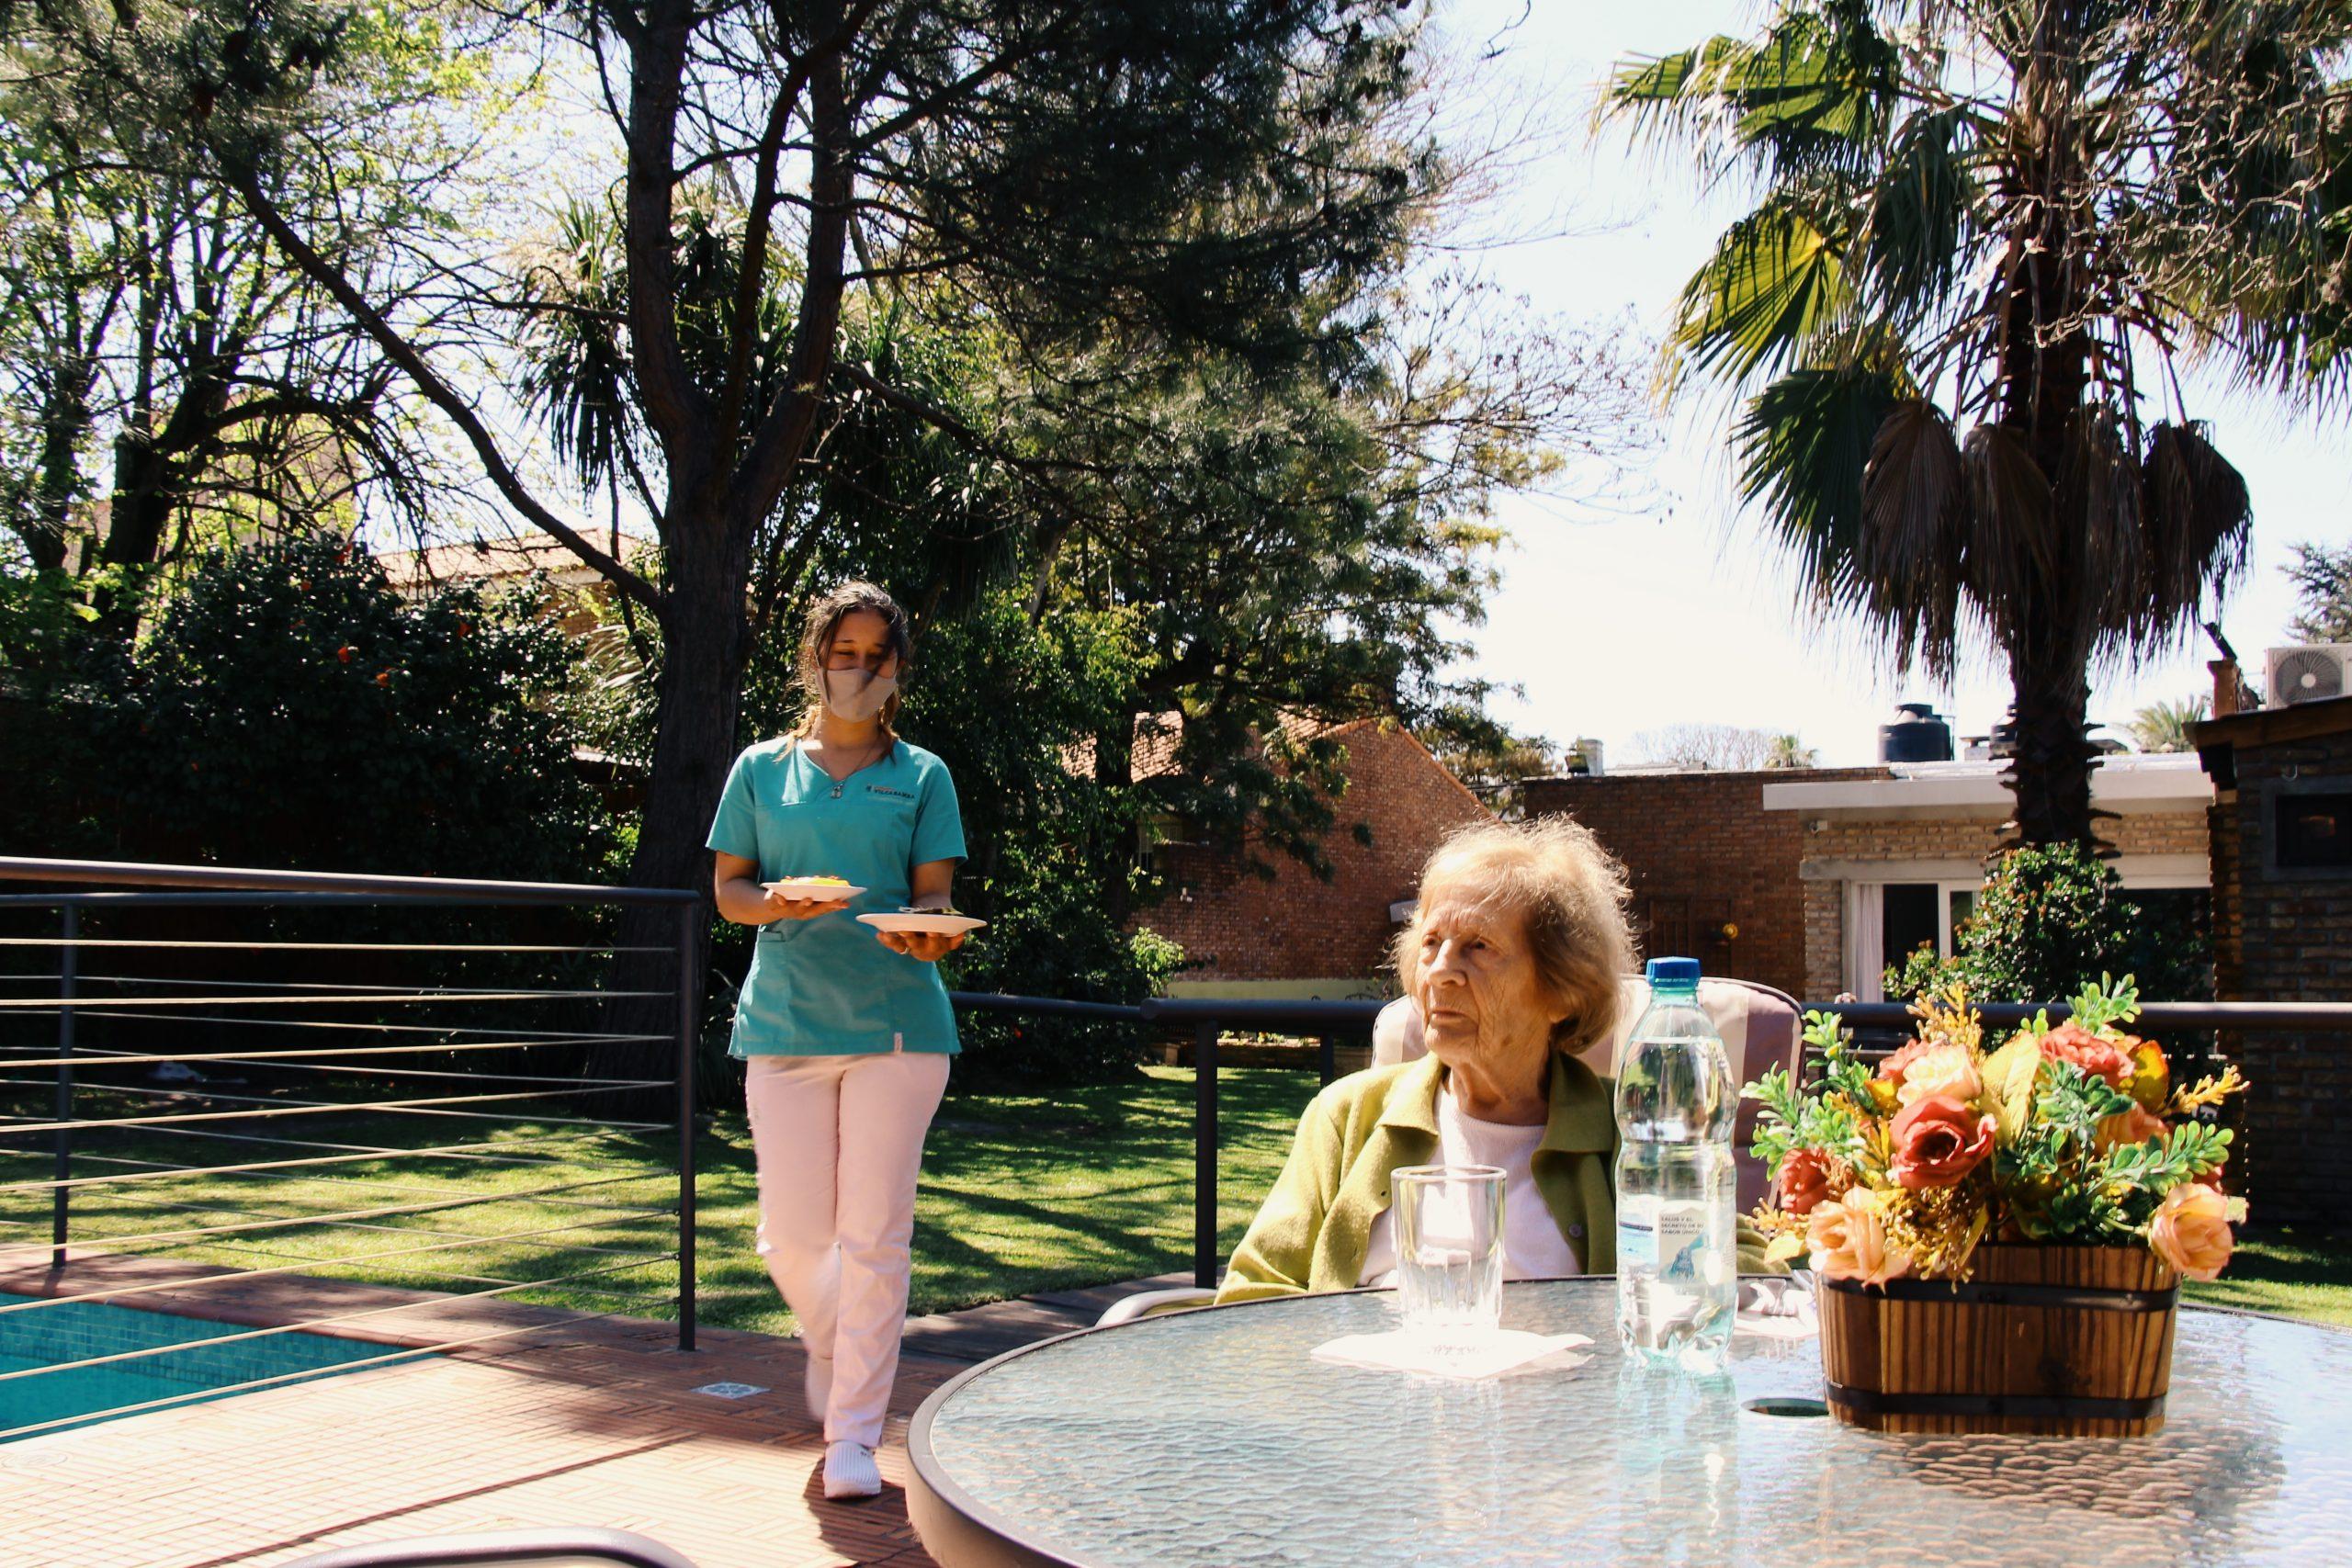 Residencial-Valle-Vilcabamba-Punta-gorda-6-scaled.jpg